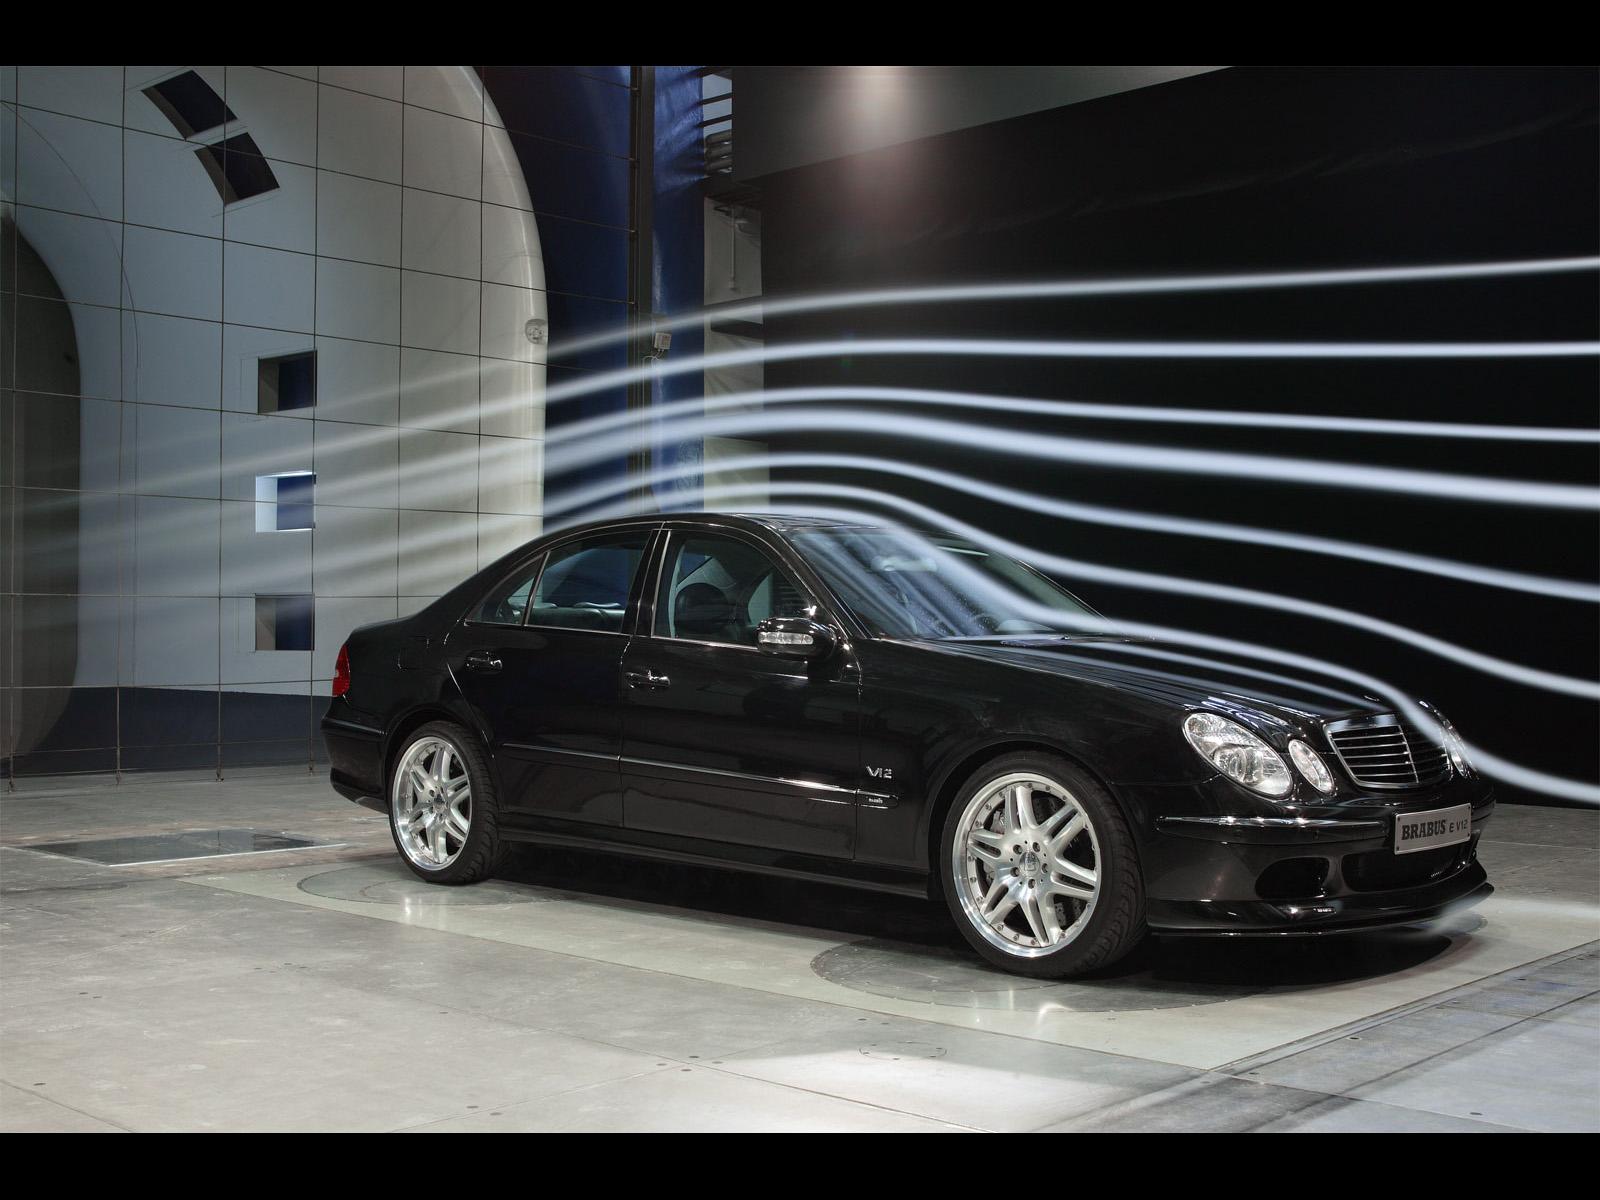 Brabus e v12 pics mercedes benz auto cars for Mercedes benz brabus price